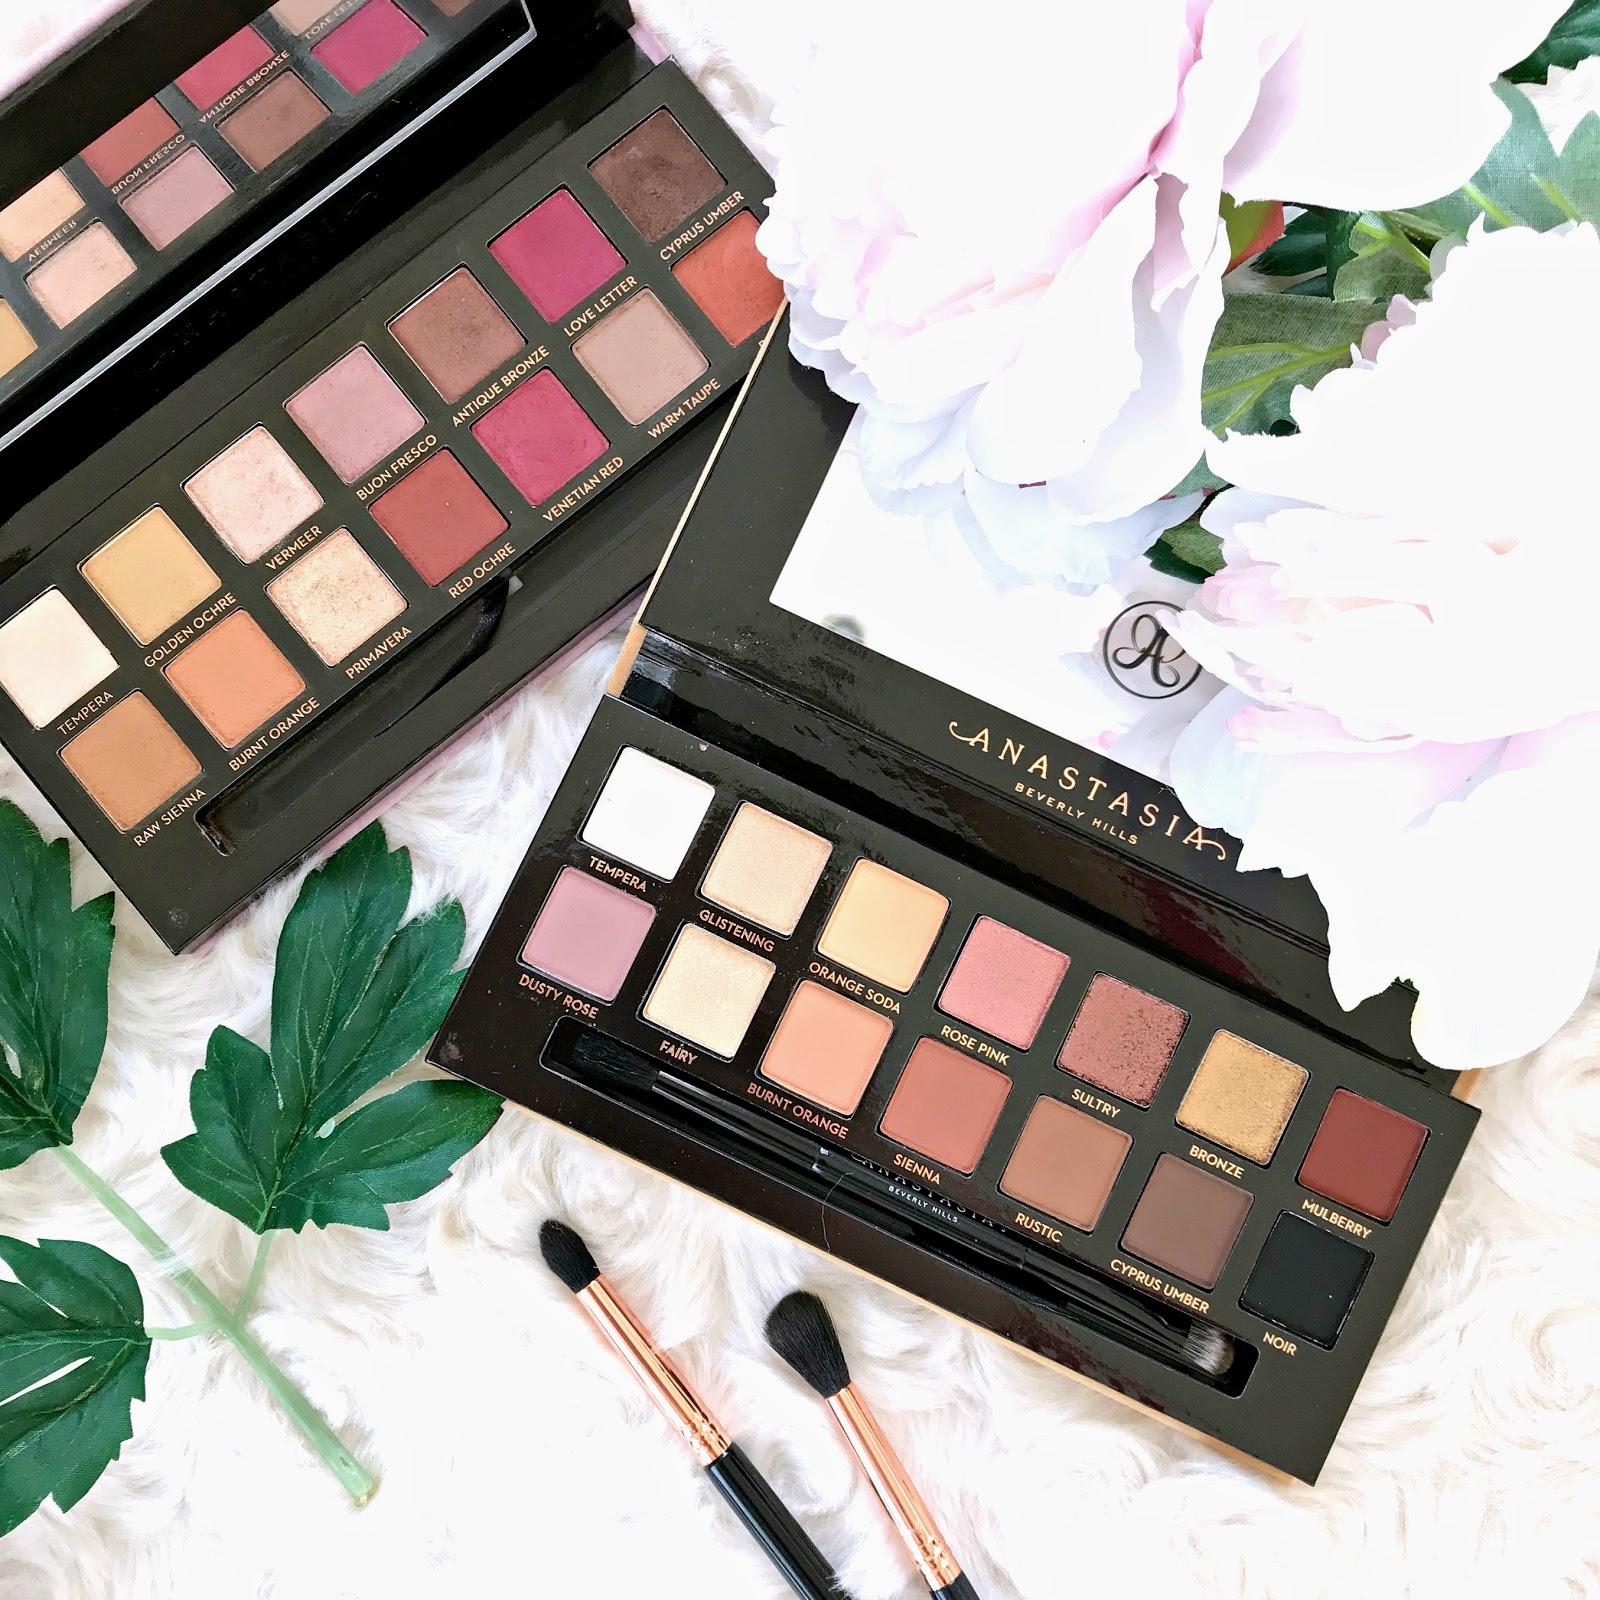 Soft Glam palette vs Modern Renaissance palette